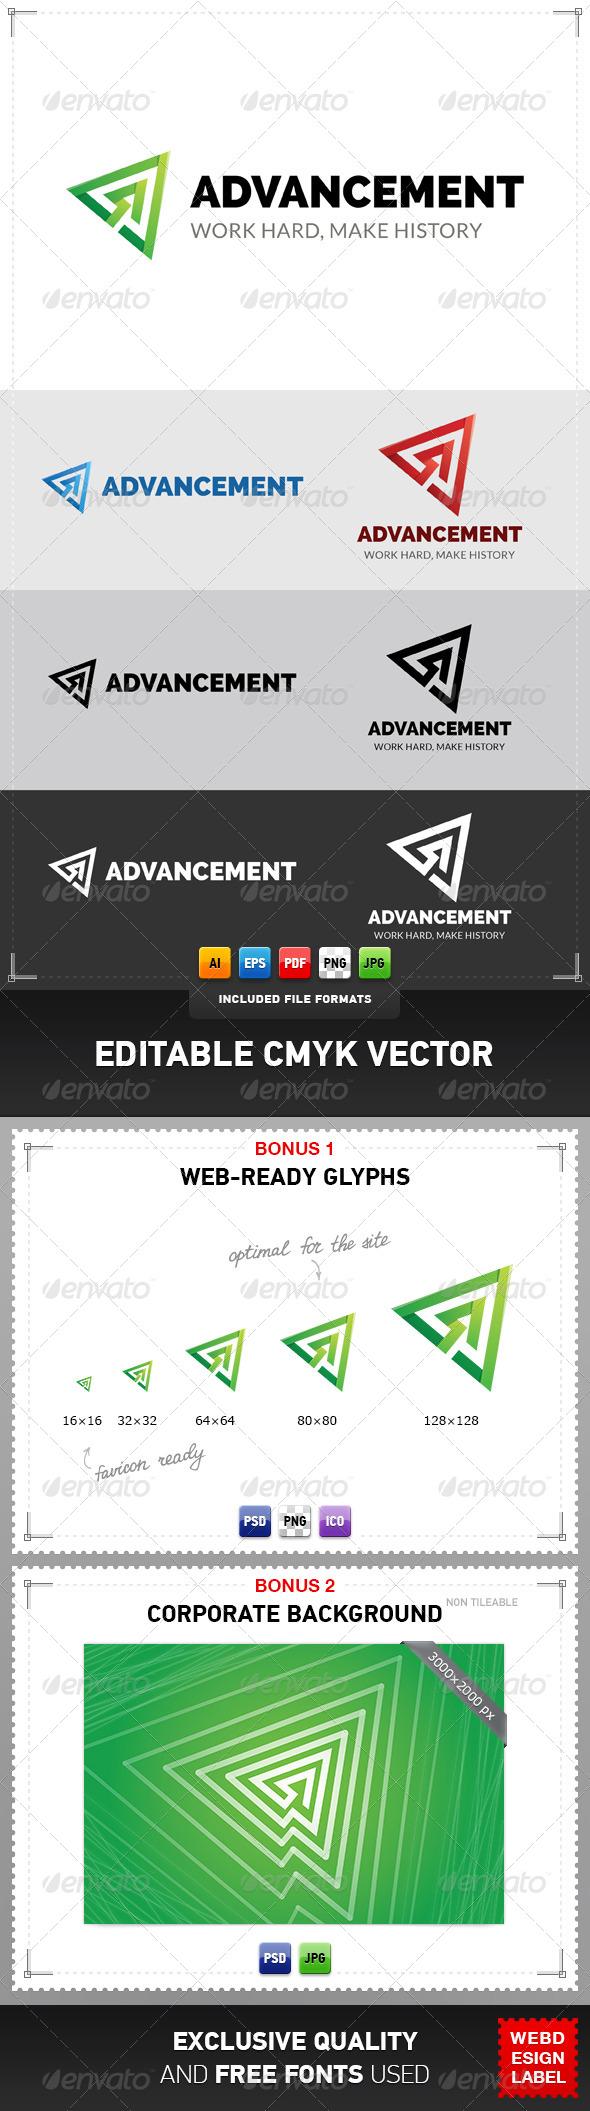 Advancement Logo - Symbols Logo Templates